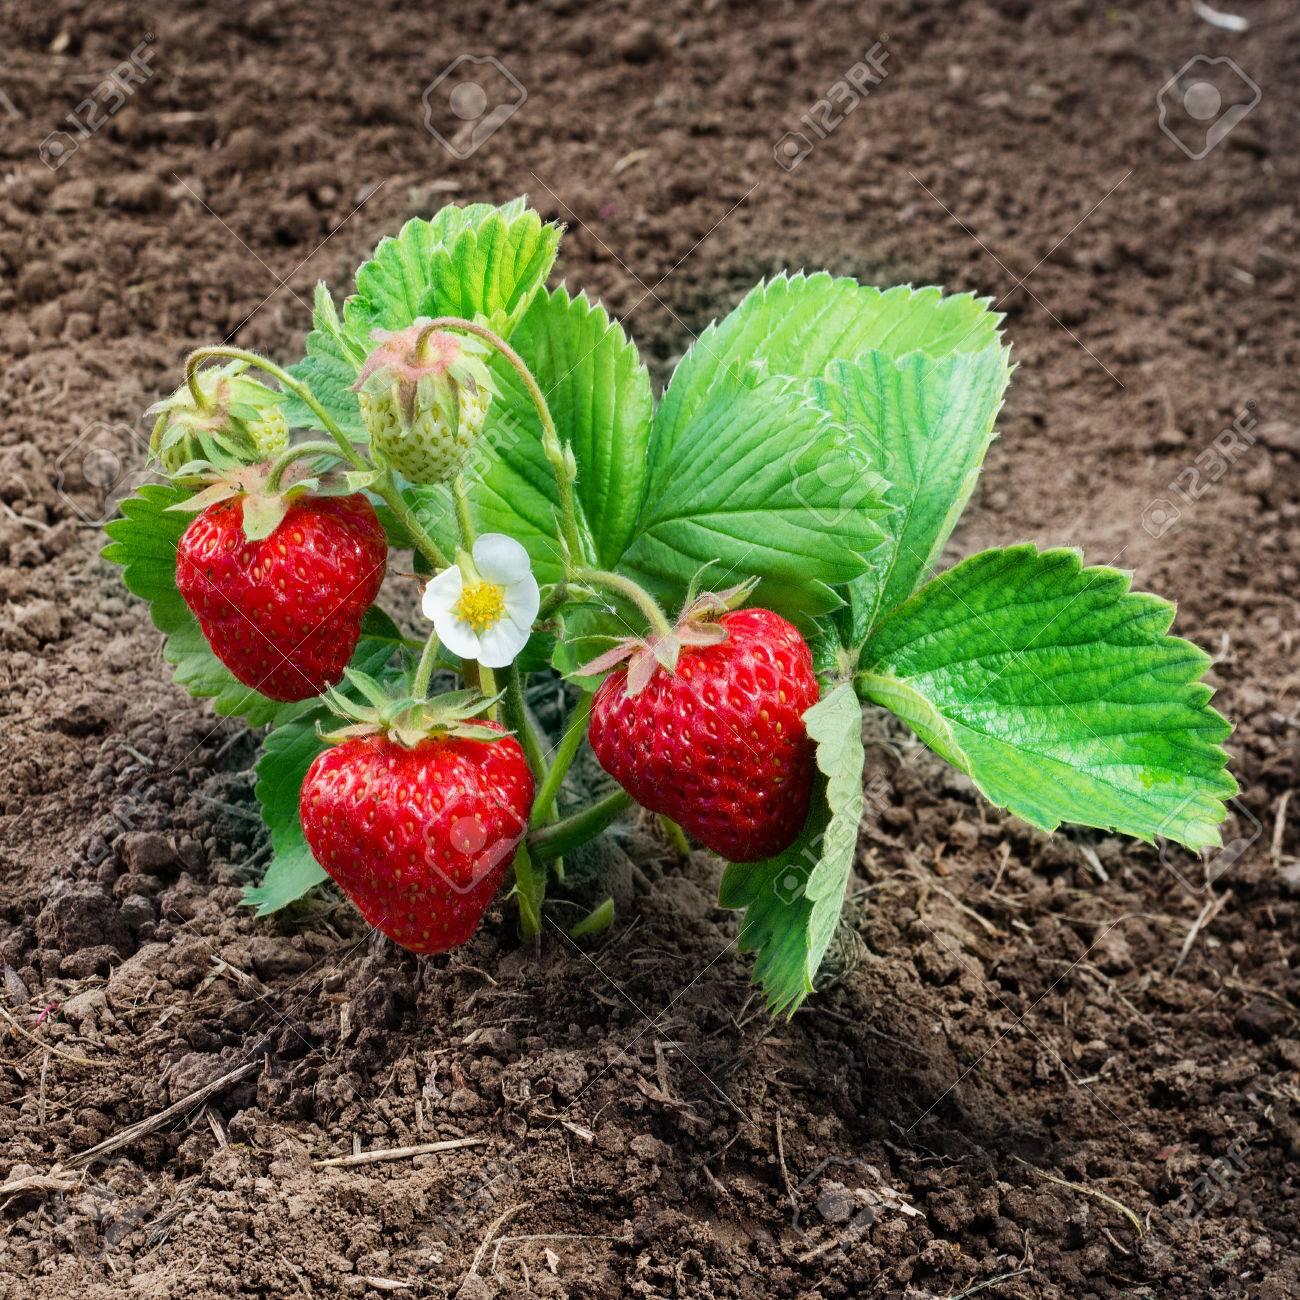 Strawberry bush grow in garden - 59831173